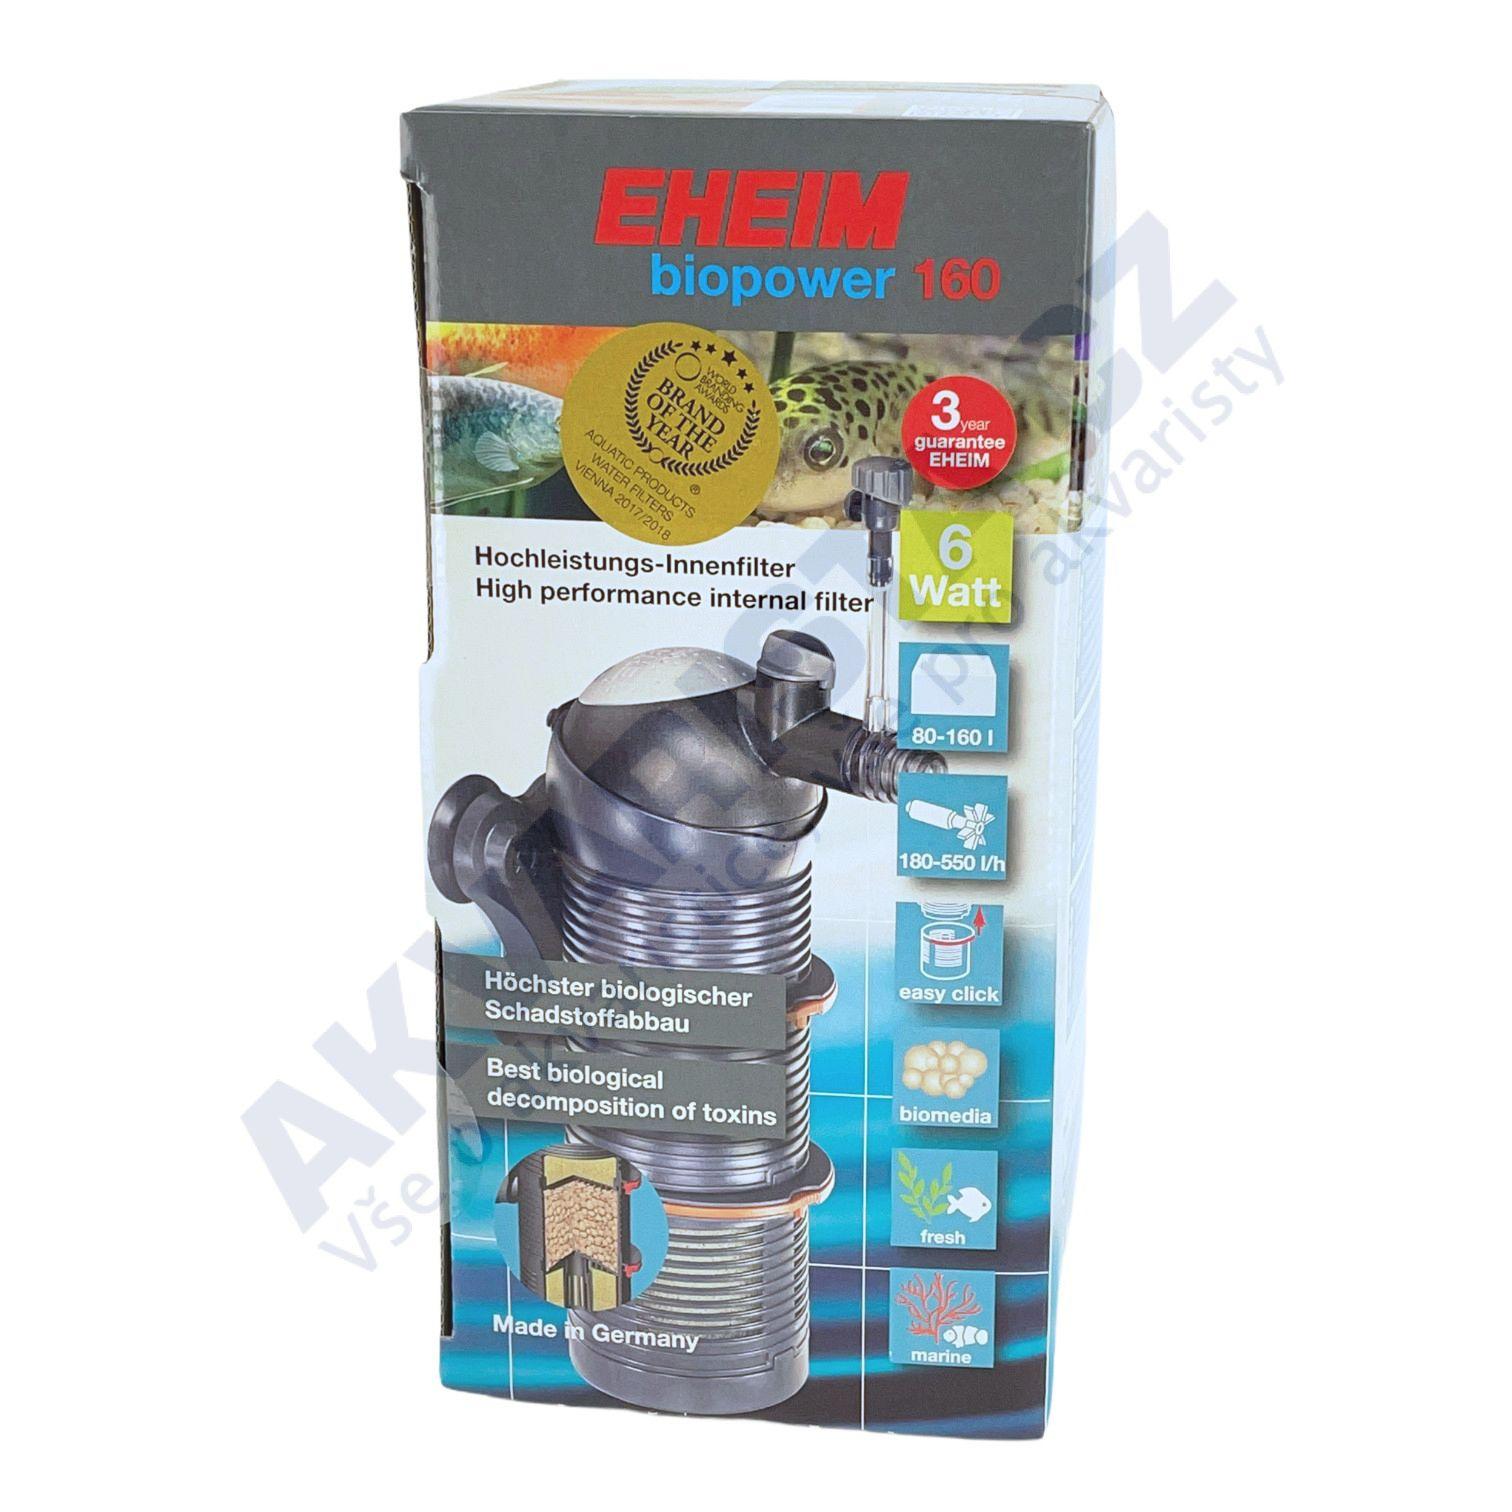 Eheim Biopower 160 (2411) pro akv. 80-160 l